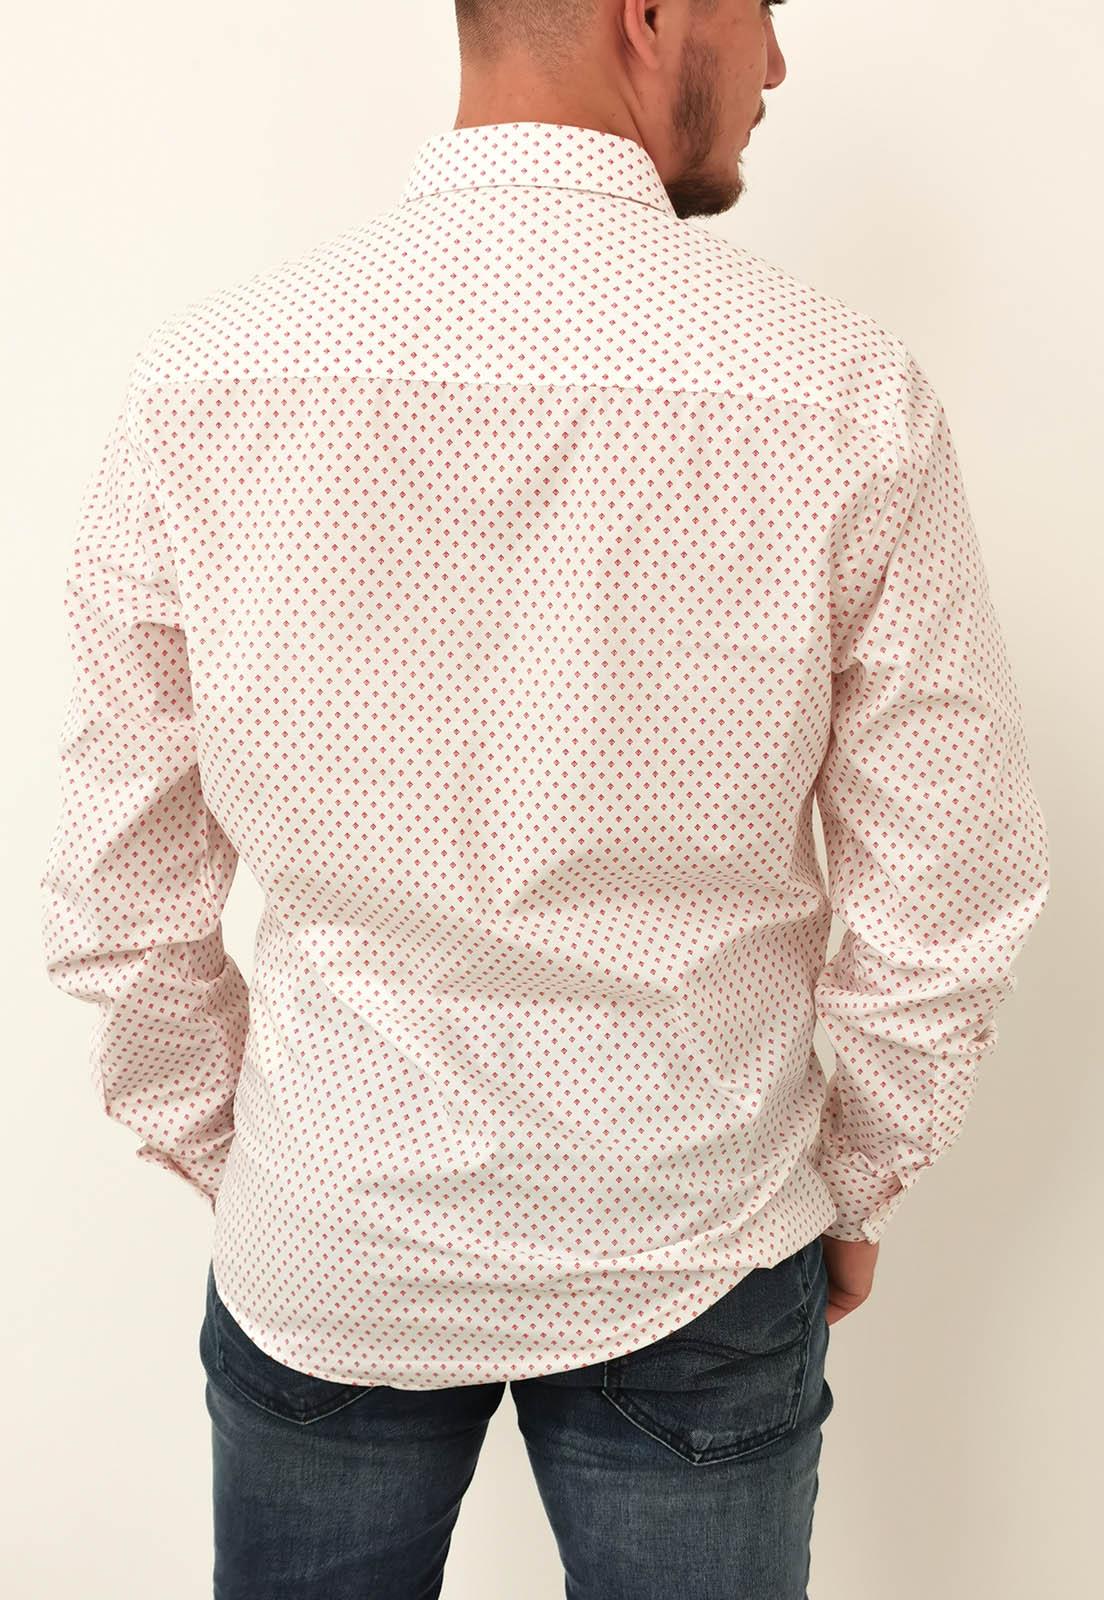 Camisa Slim Colcci Branca Com Detalhes Rosa